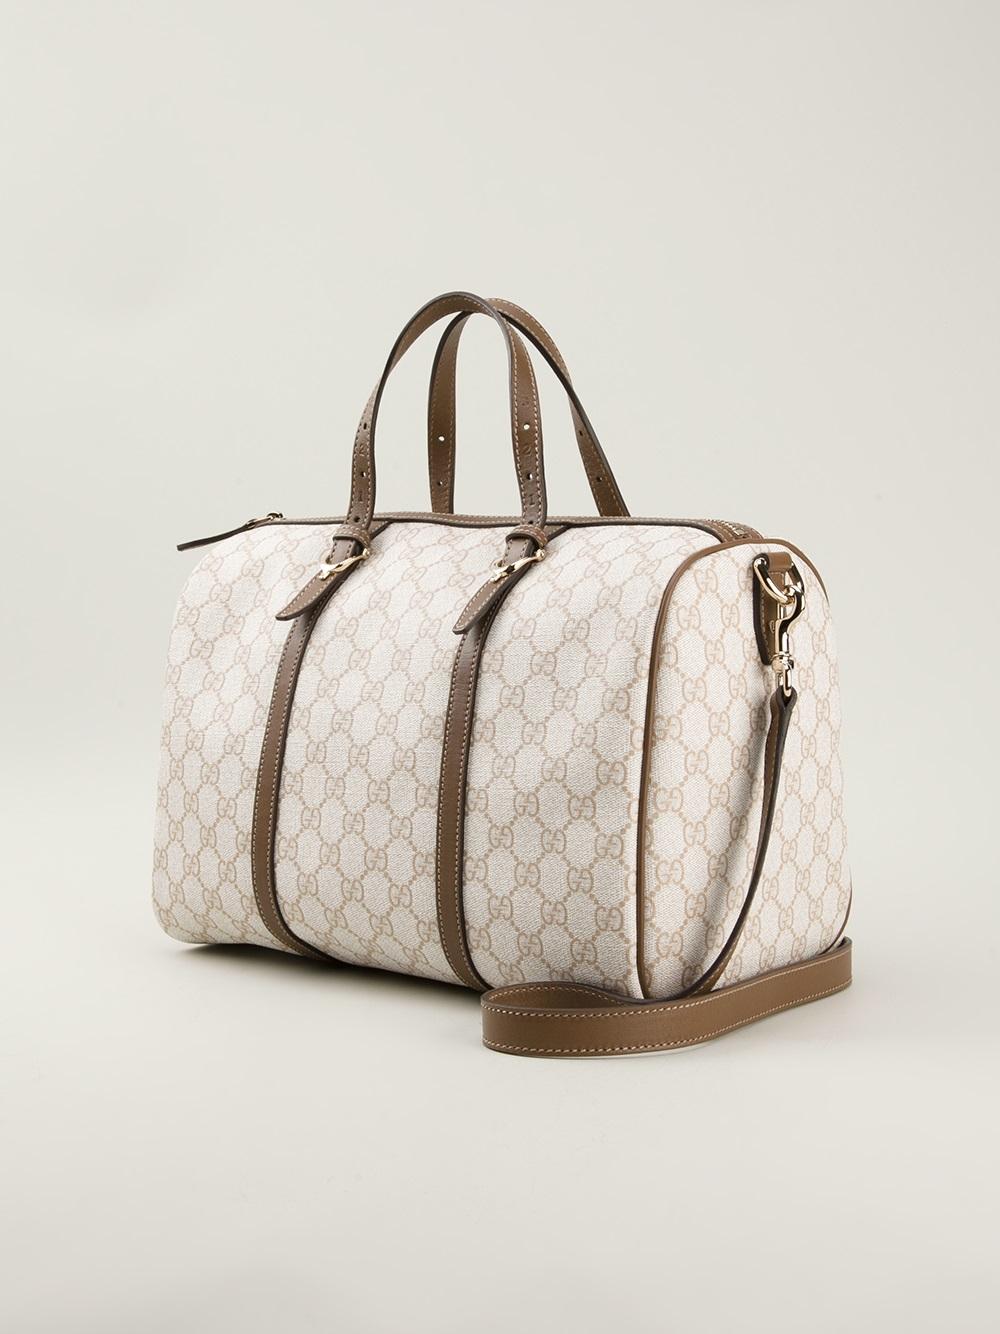 4bf3e10ba02c Gucci Boston Bowling Bag in Natural - Lyst